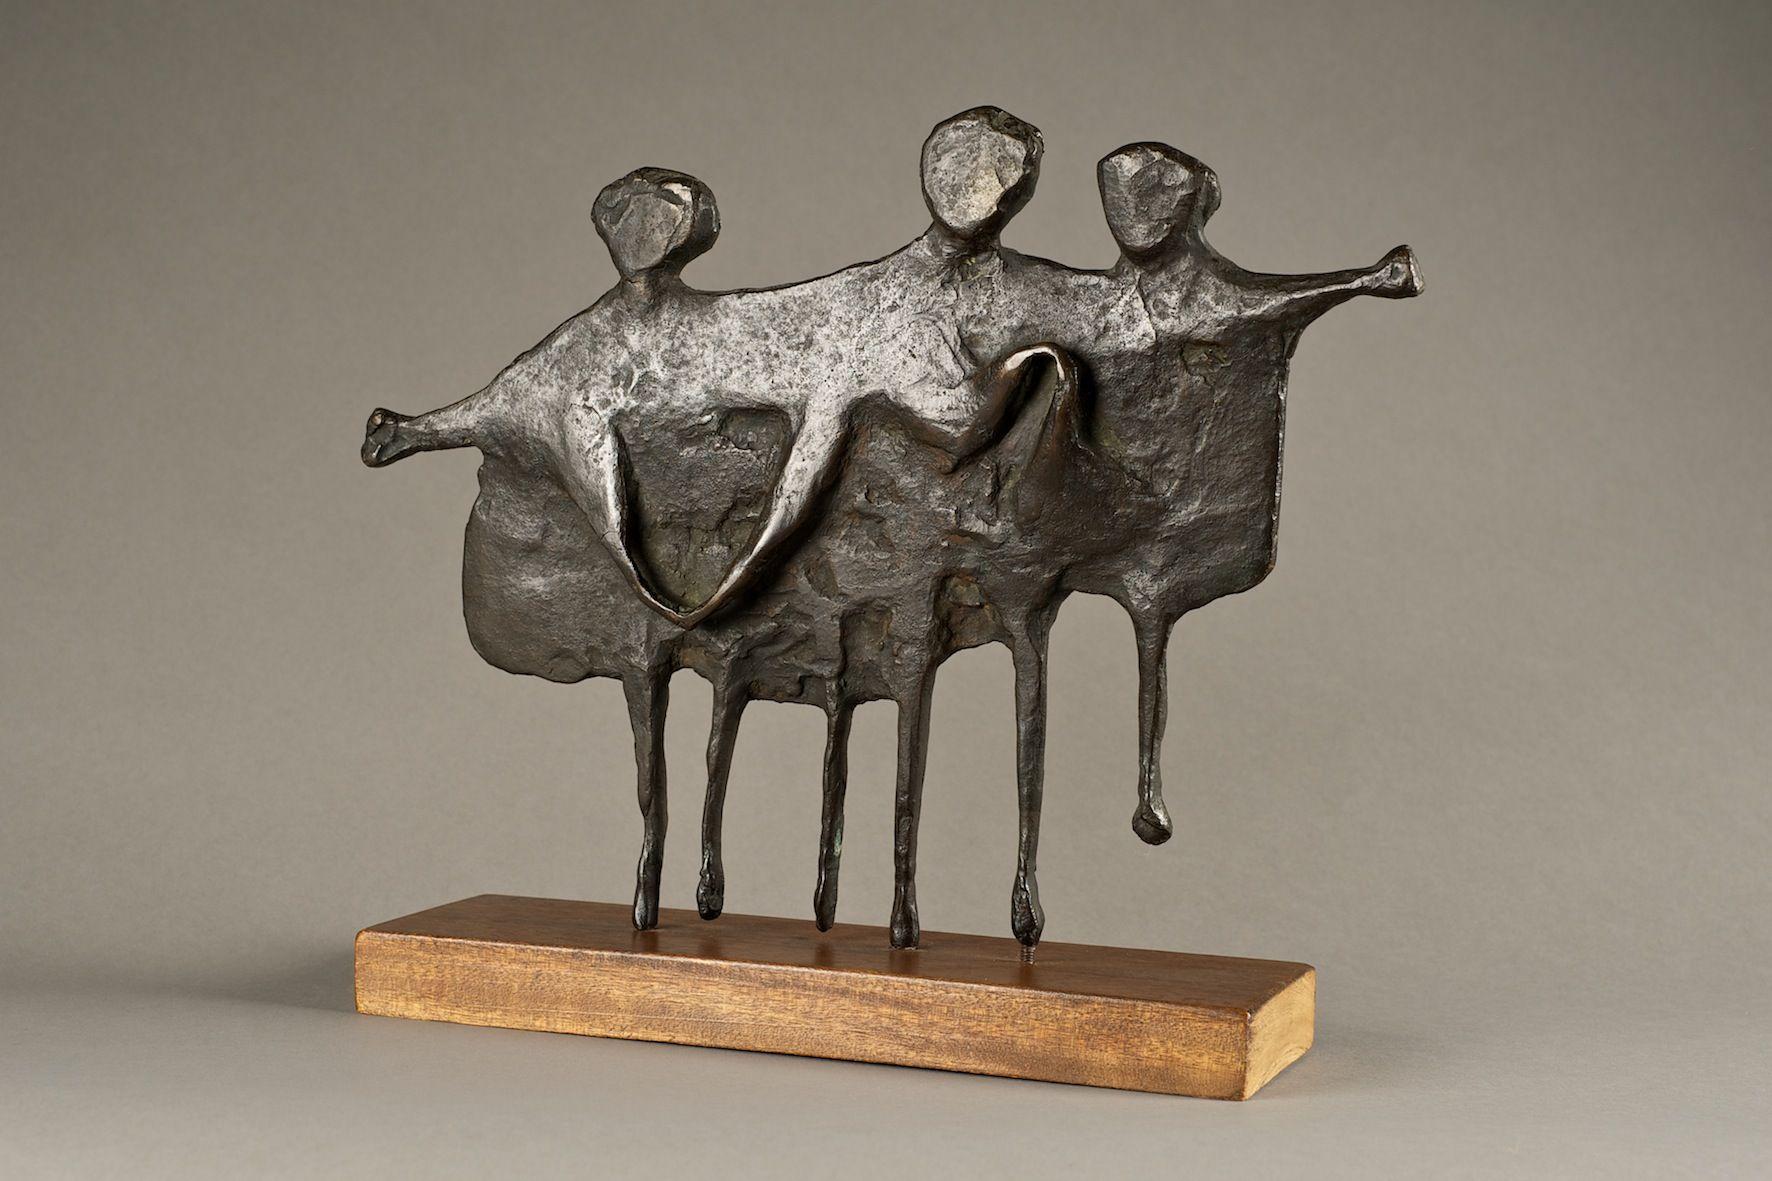 Kenneth Armitage - Children Playing - 1953